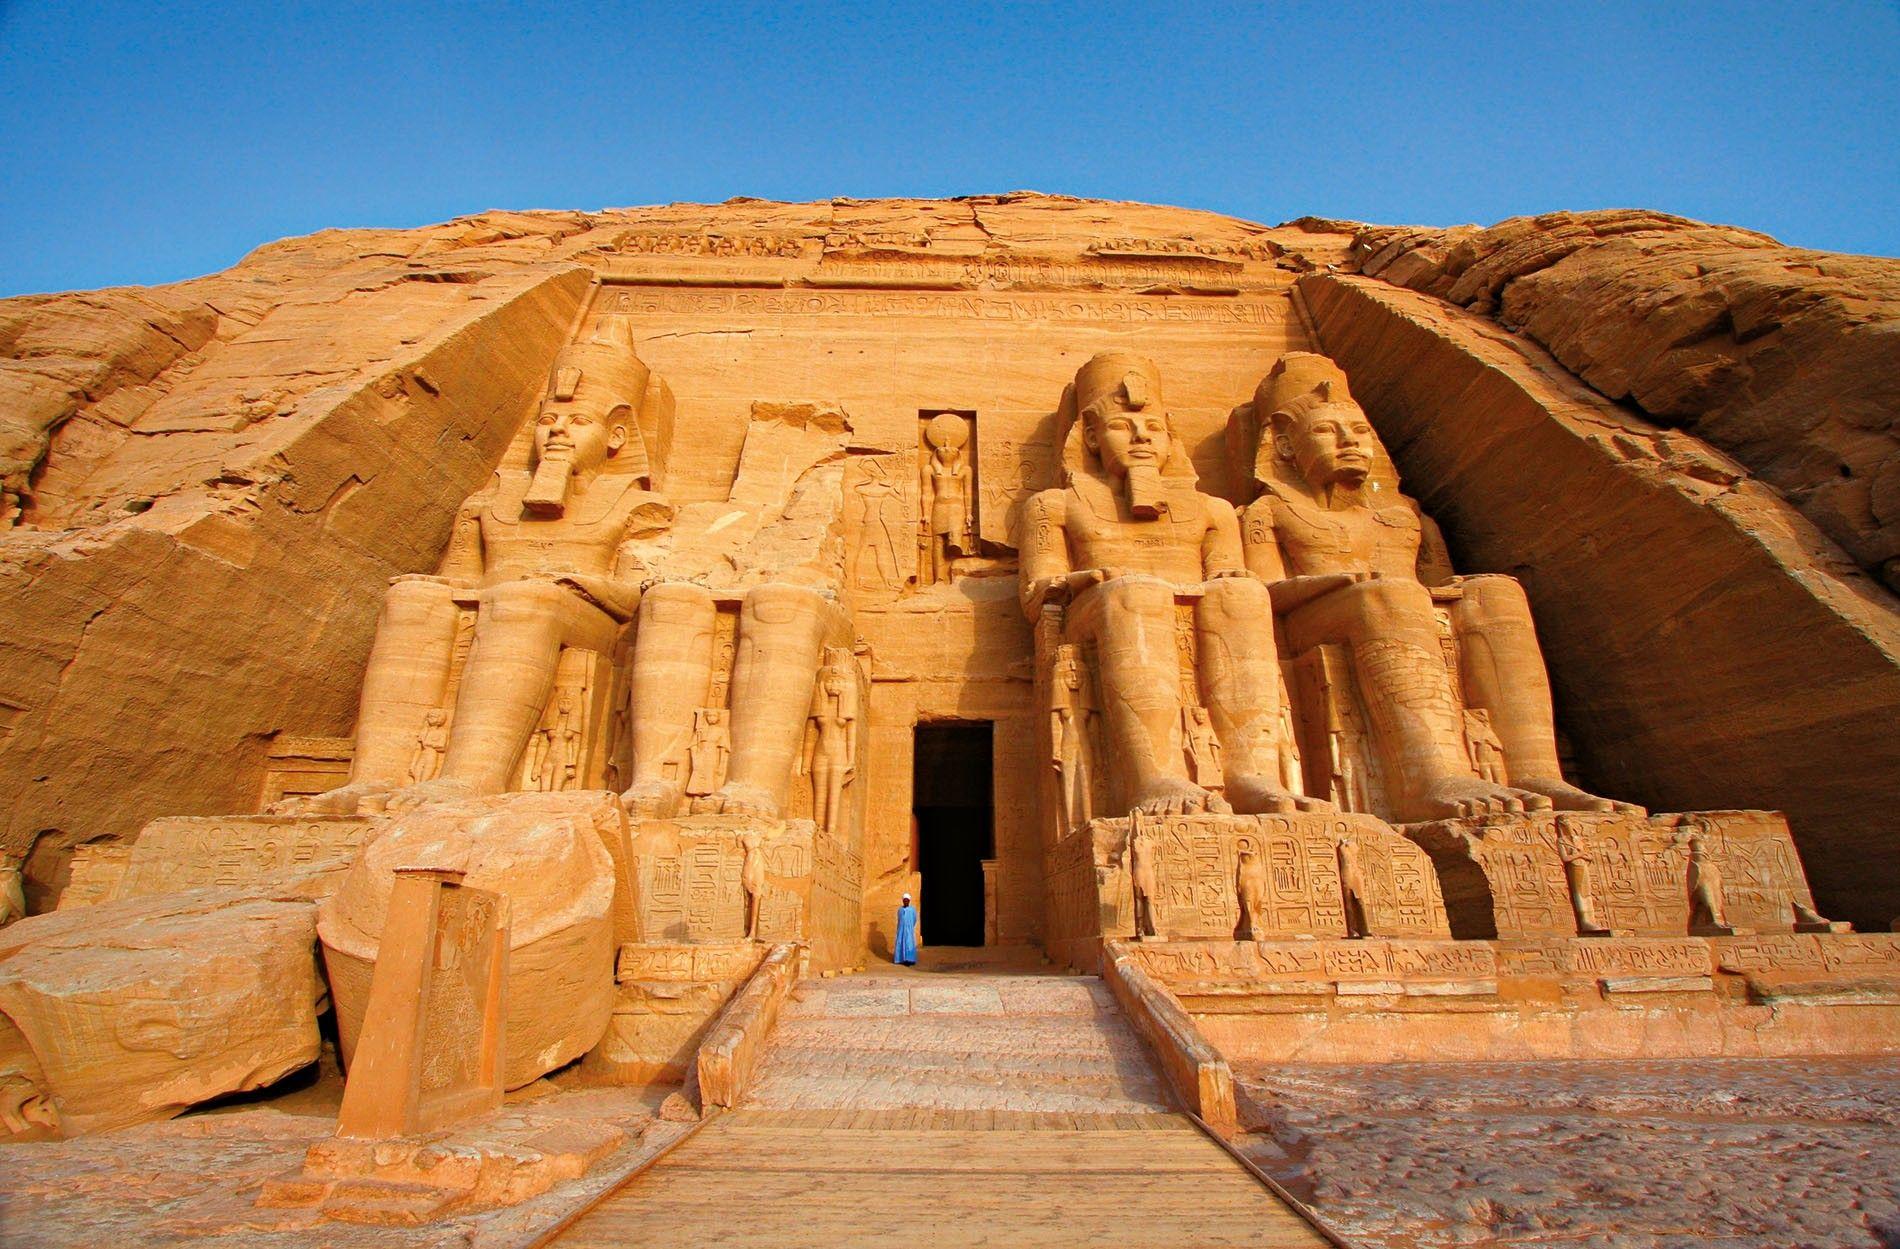 Colossal statues of Egyptian pharaoh Ramses II guard the entrance to Abu Simbel's main temple.